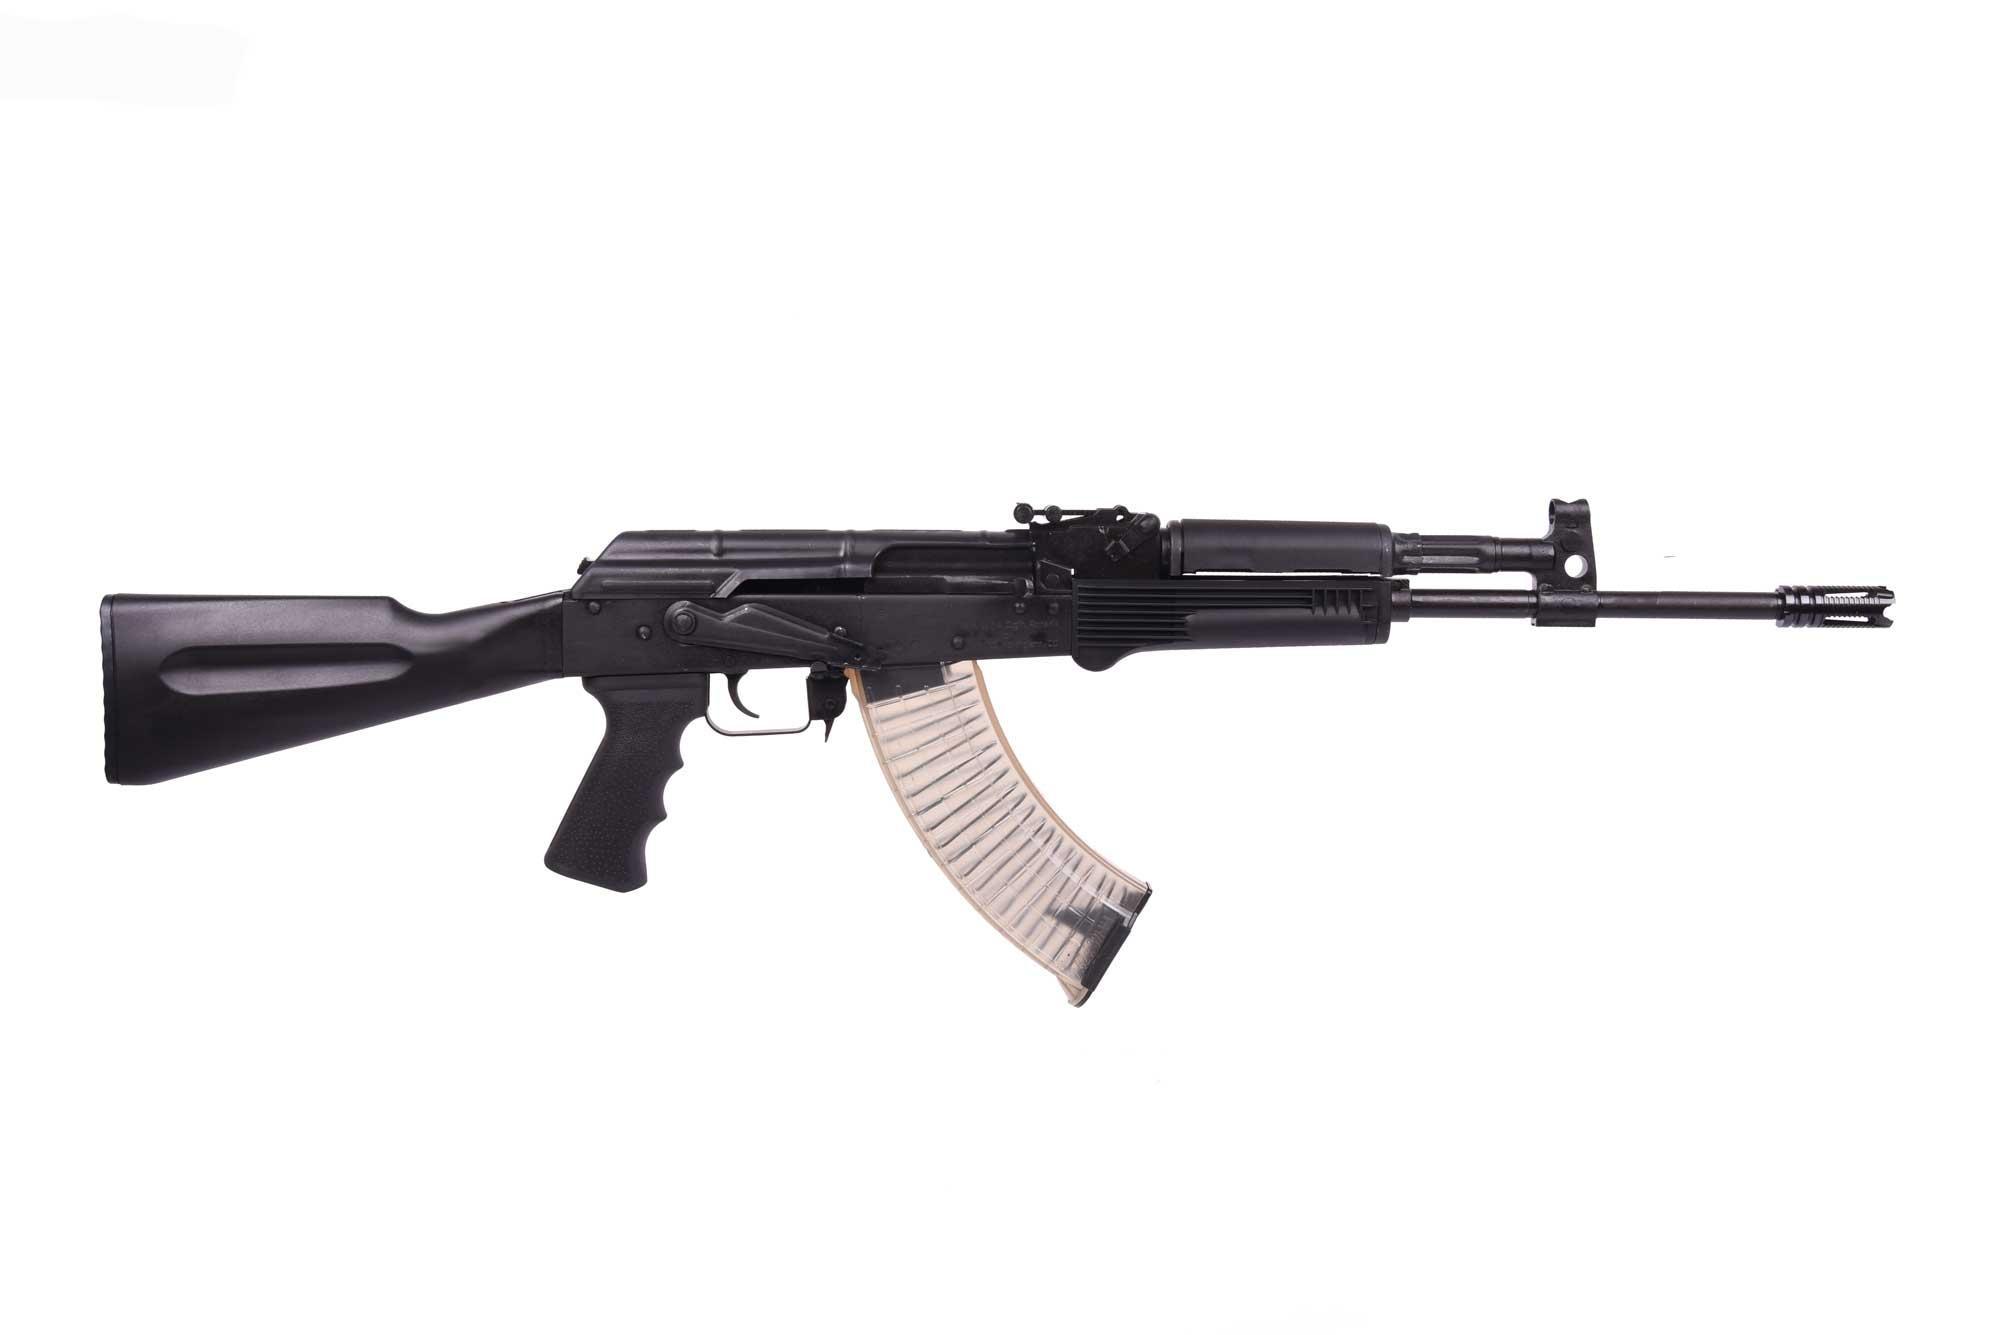 M10-762 7.62X39 PKZ/SYN 30+1  - MM1-1M10-762